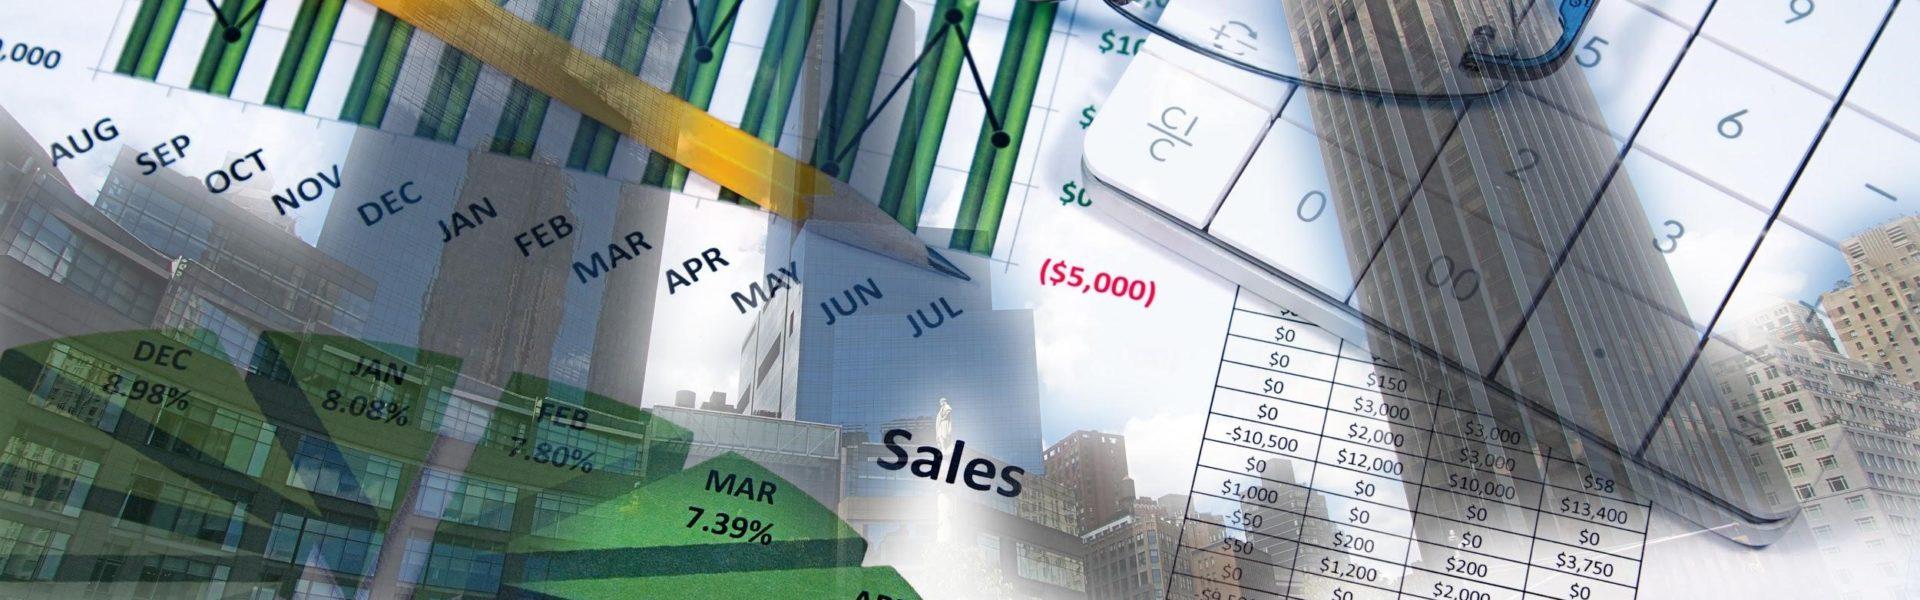 Effective Lead Nurturing For Increased Sales